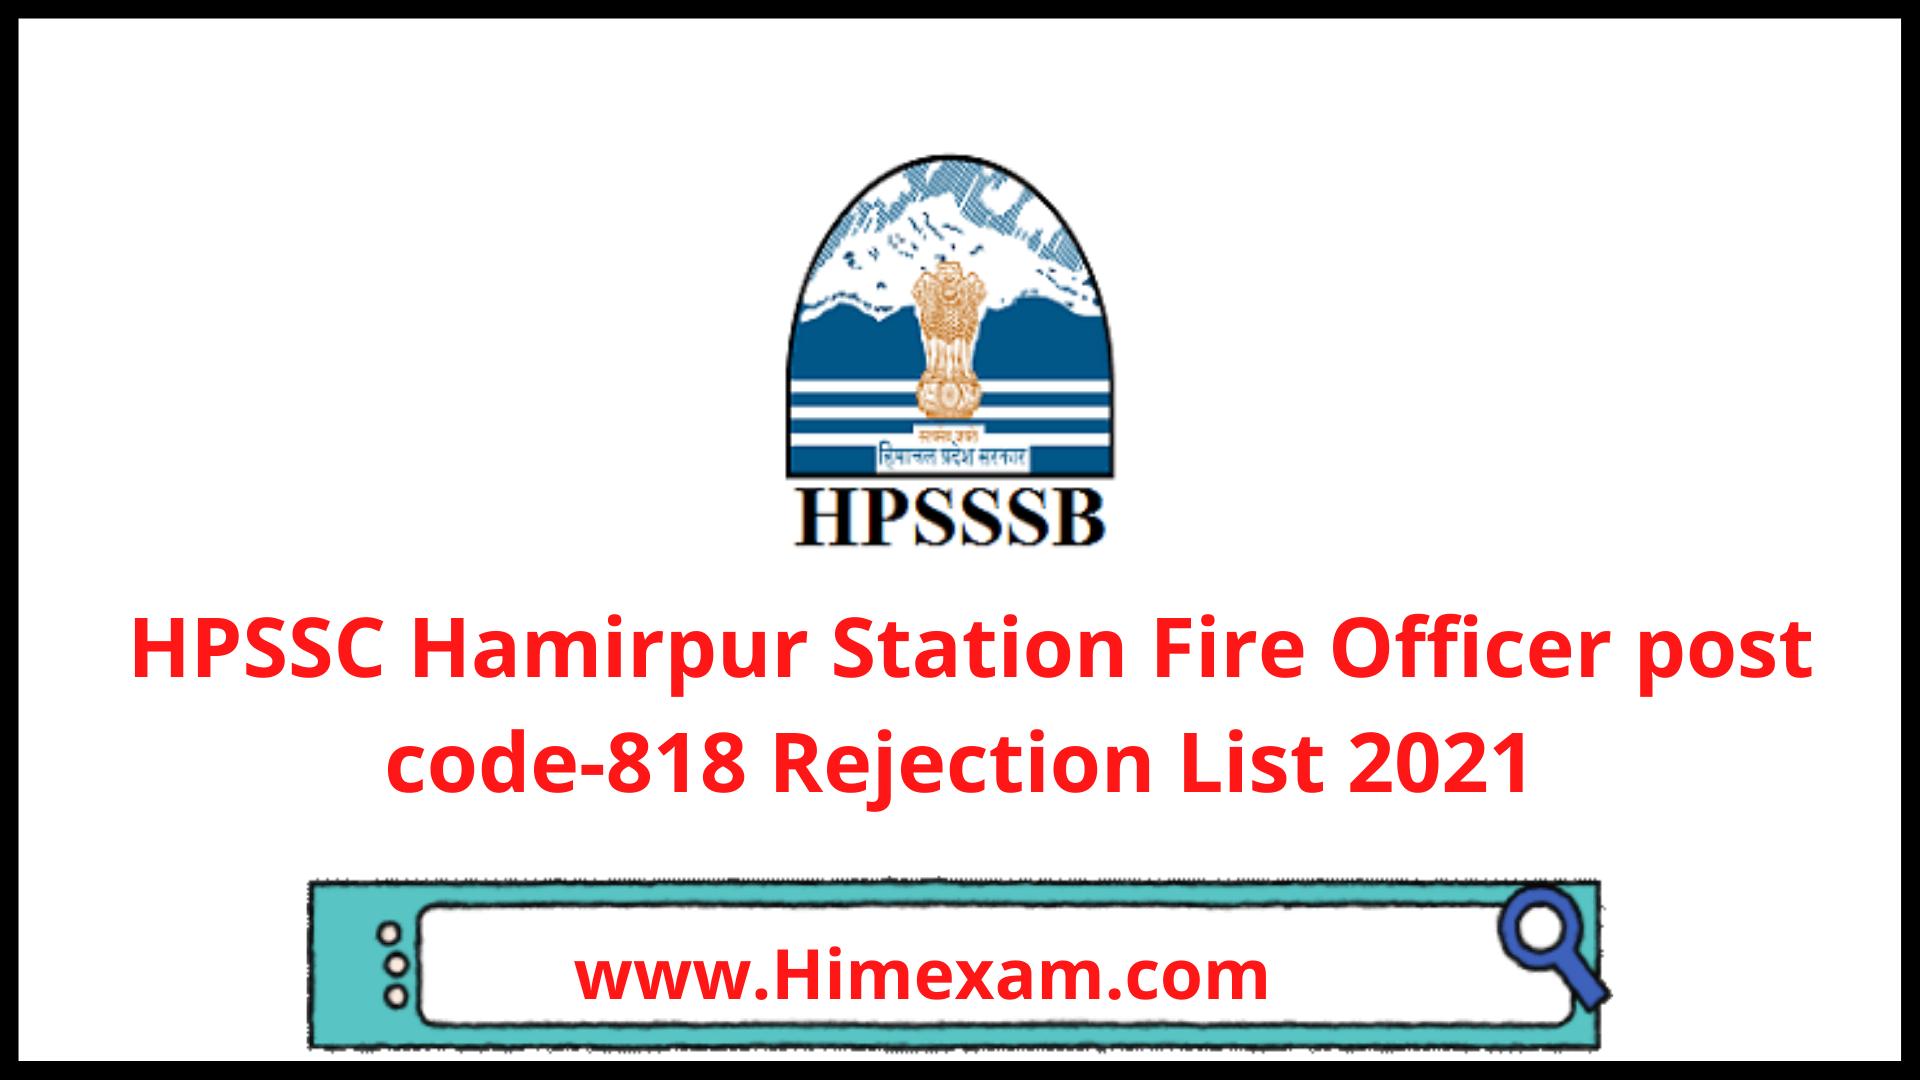 HPSSC Hamirpur Station Fire Officer Post code 818 Roll Number List 2021